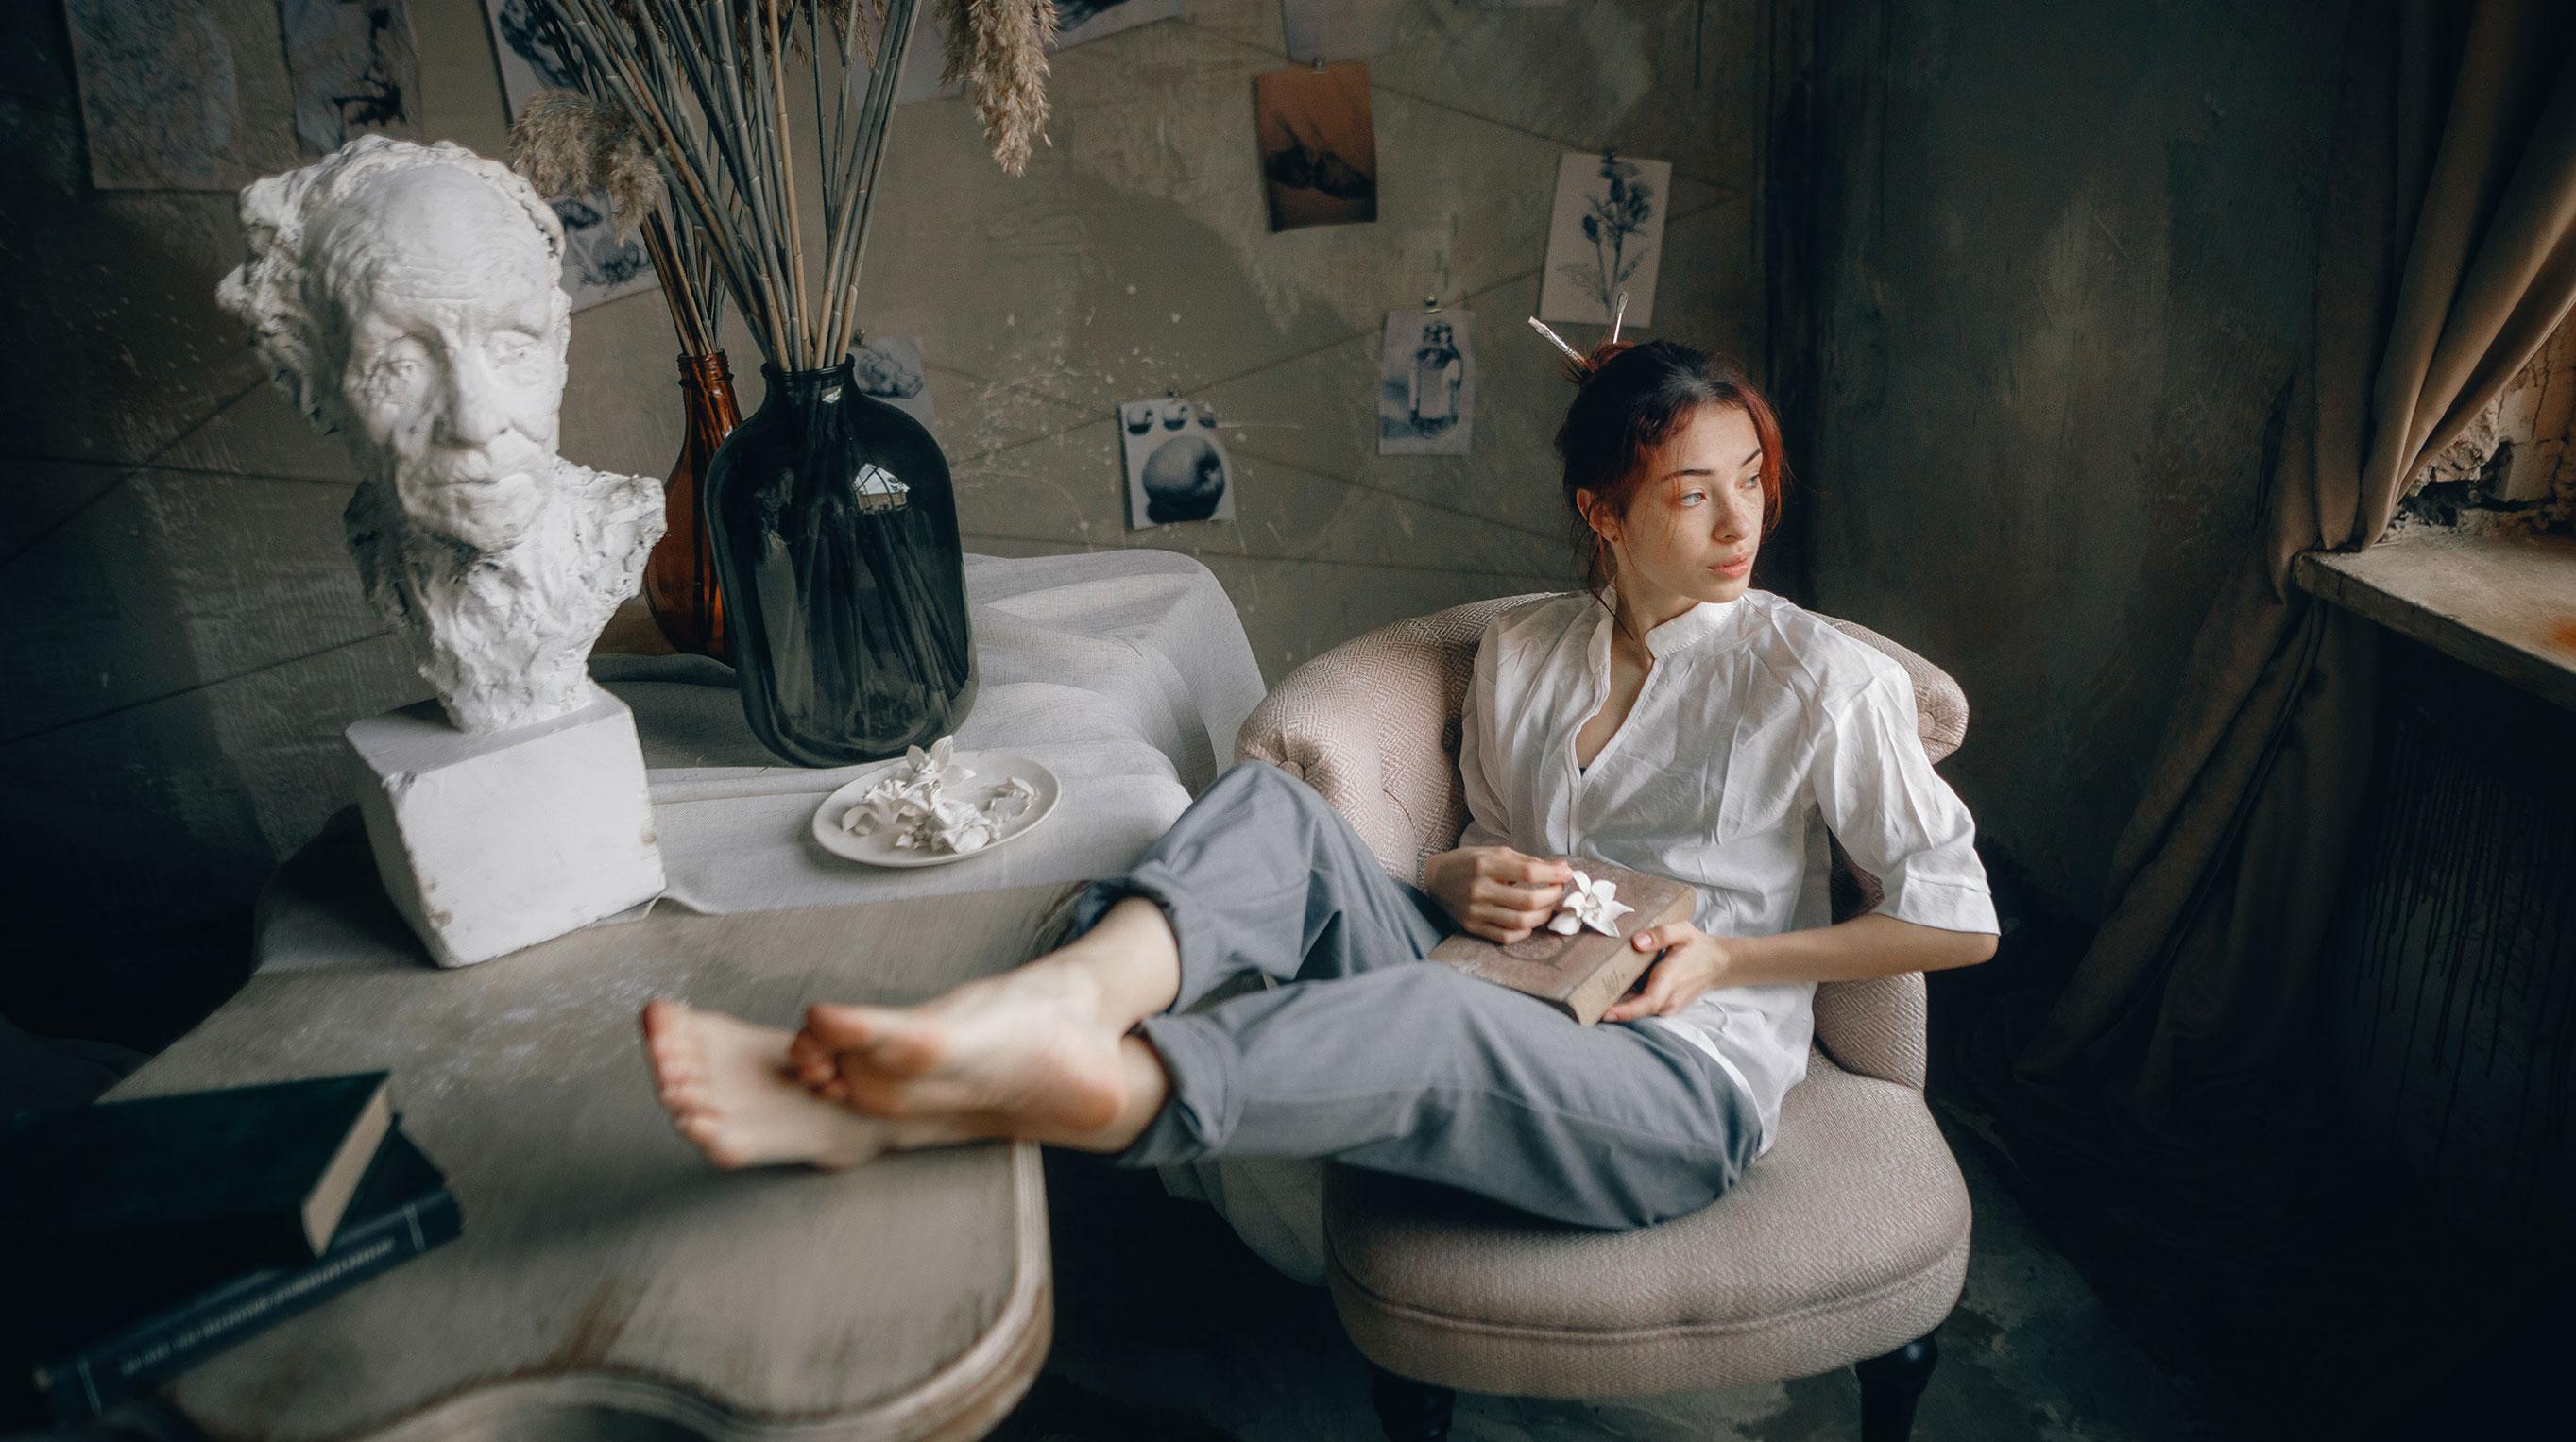 Елизавета Трофимова в ожидании вдохновения / фото 01